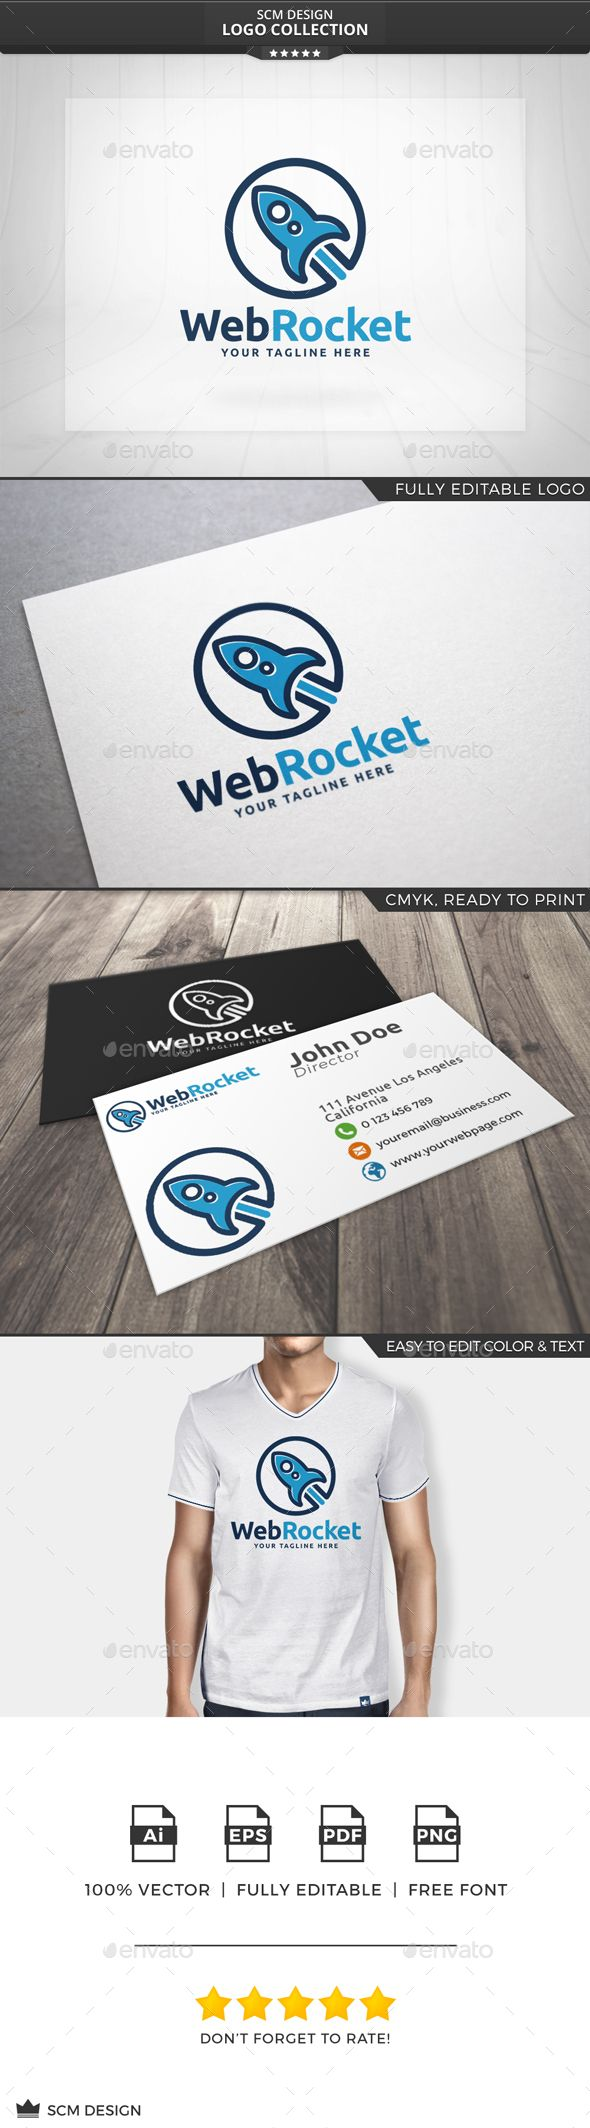 Web Rocket Logo — Vector EPS #blue #identity • Available here → https://graphicriver.net/item/web-rocket-logo/13454544?ref=pxcr